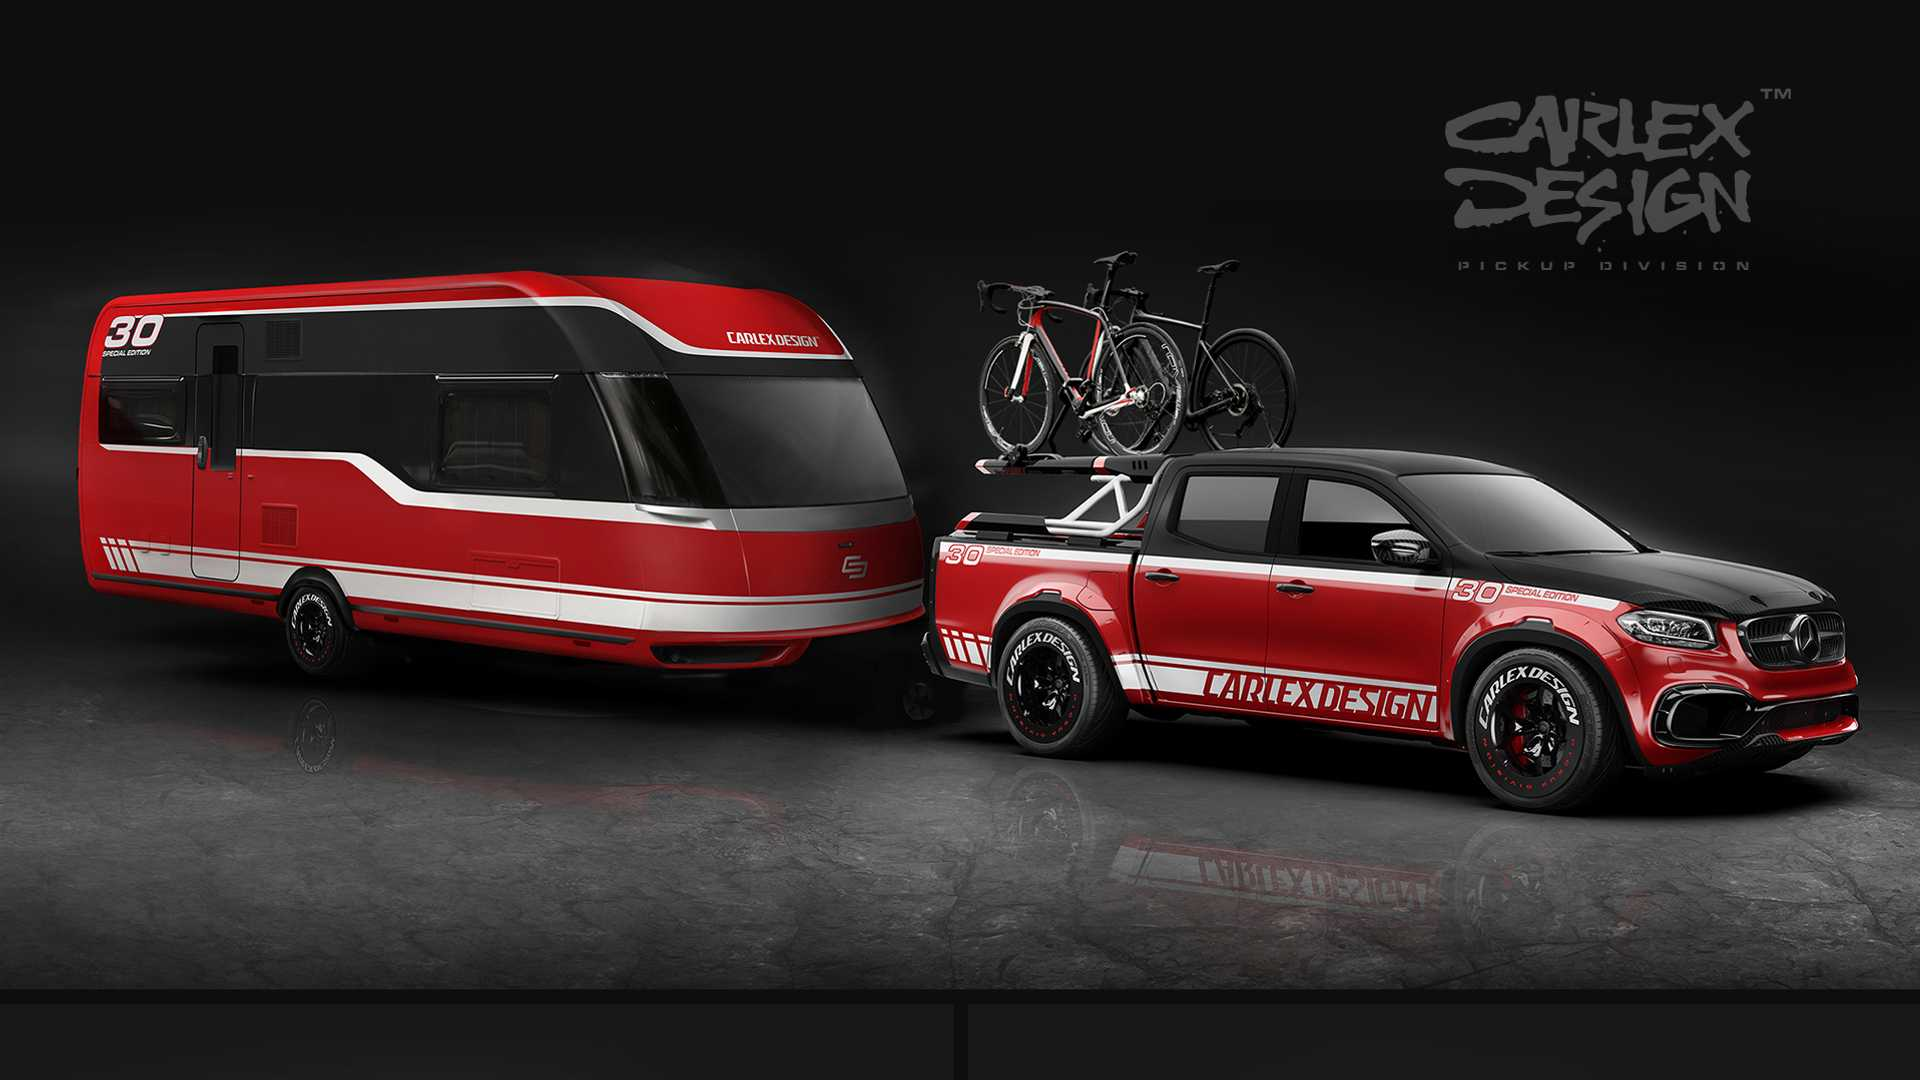 mercedes-benz-x-class-bicycle-hauler-pickup-design-1